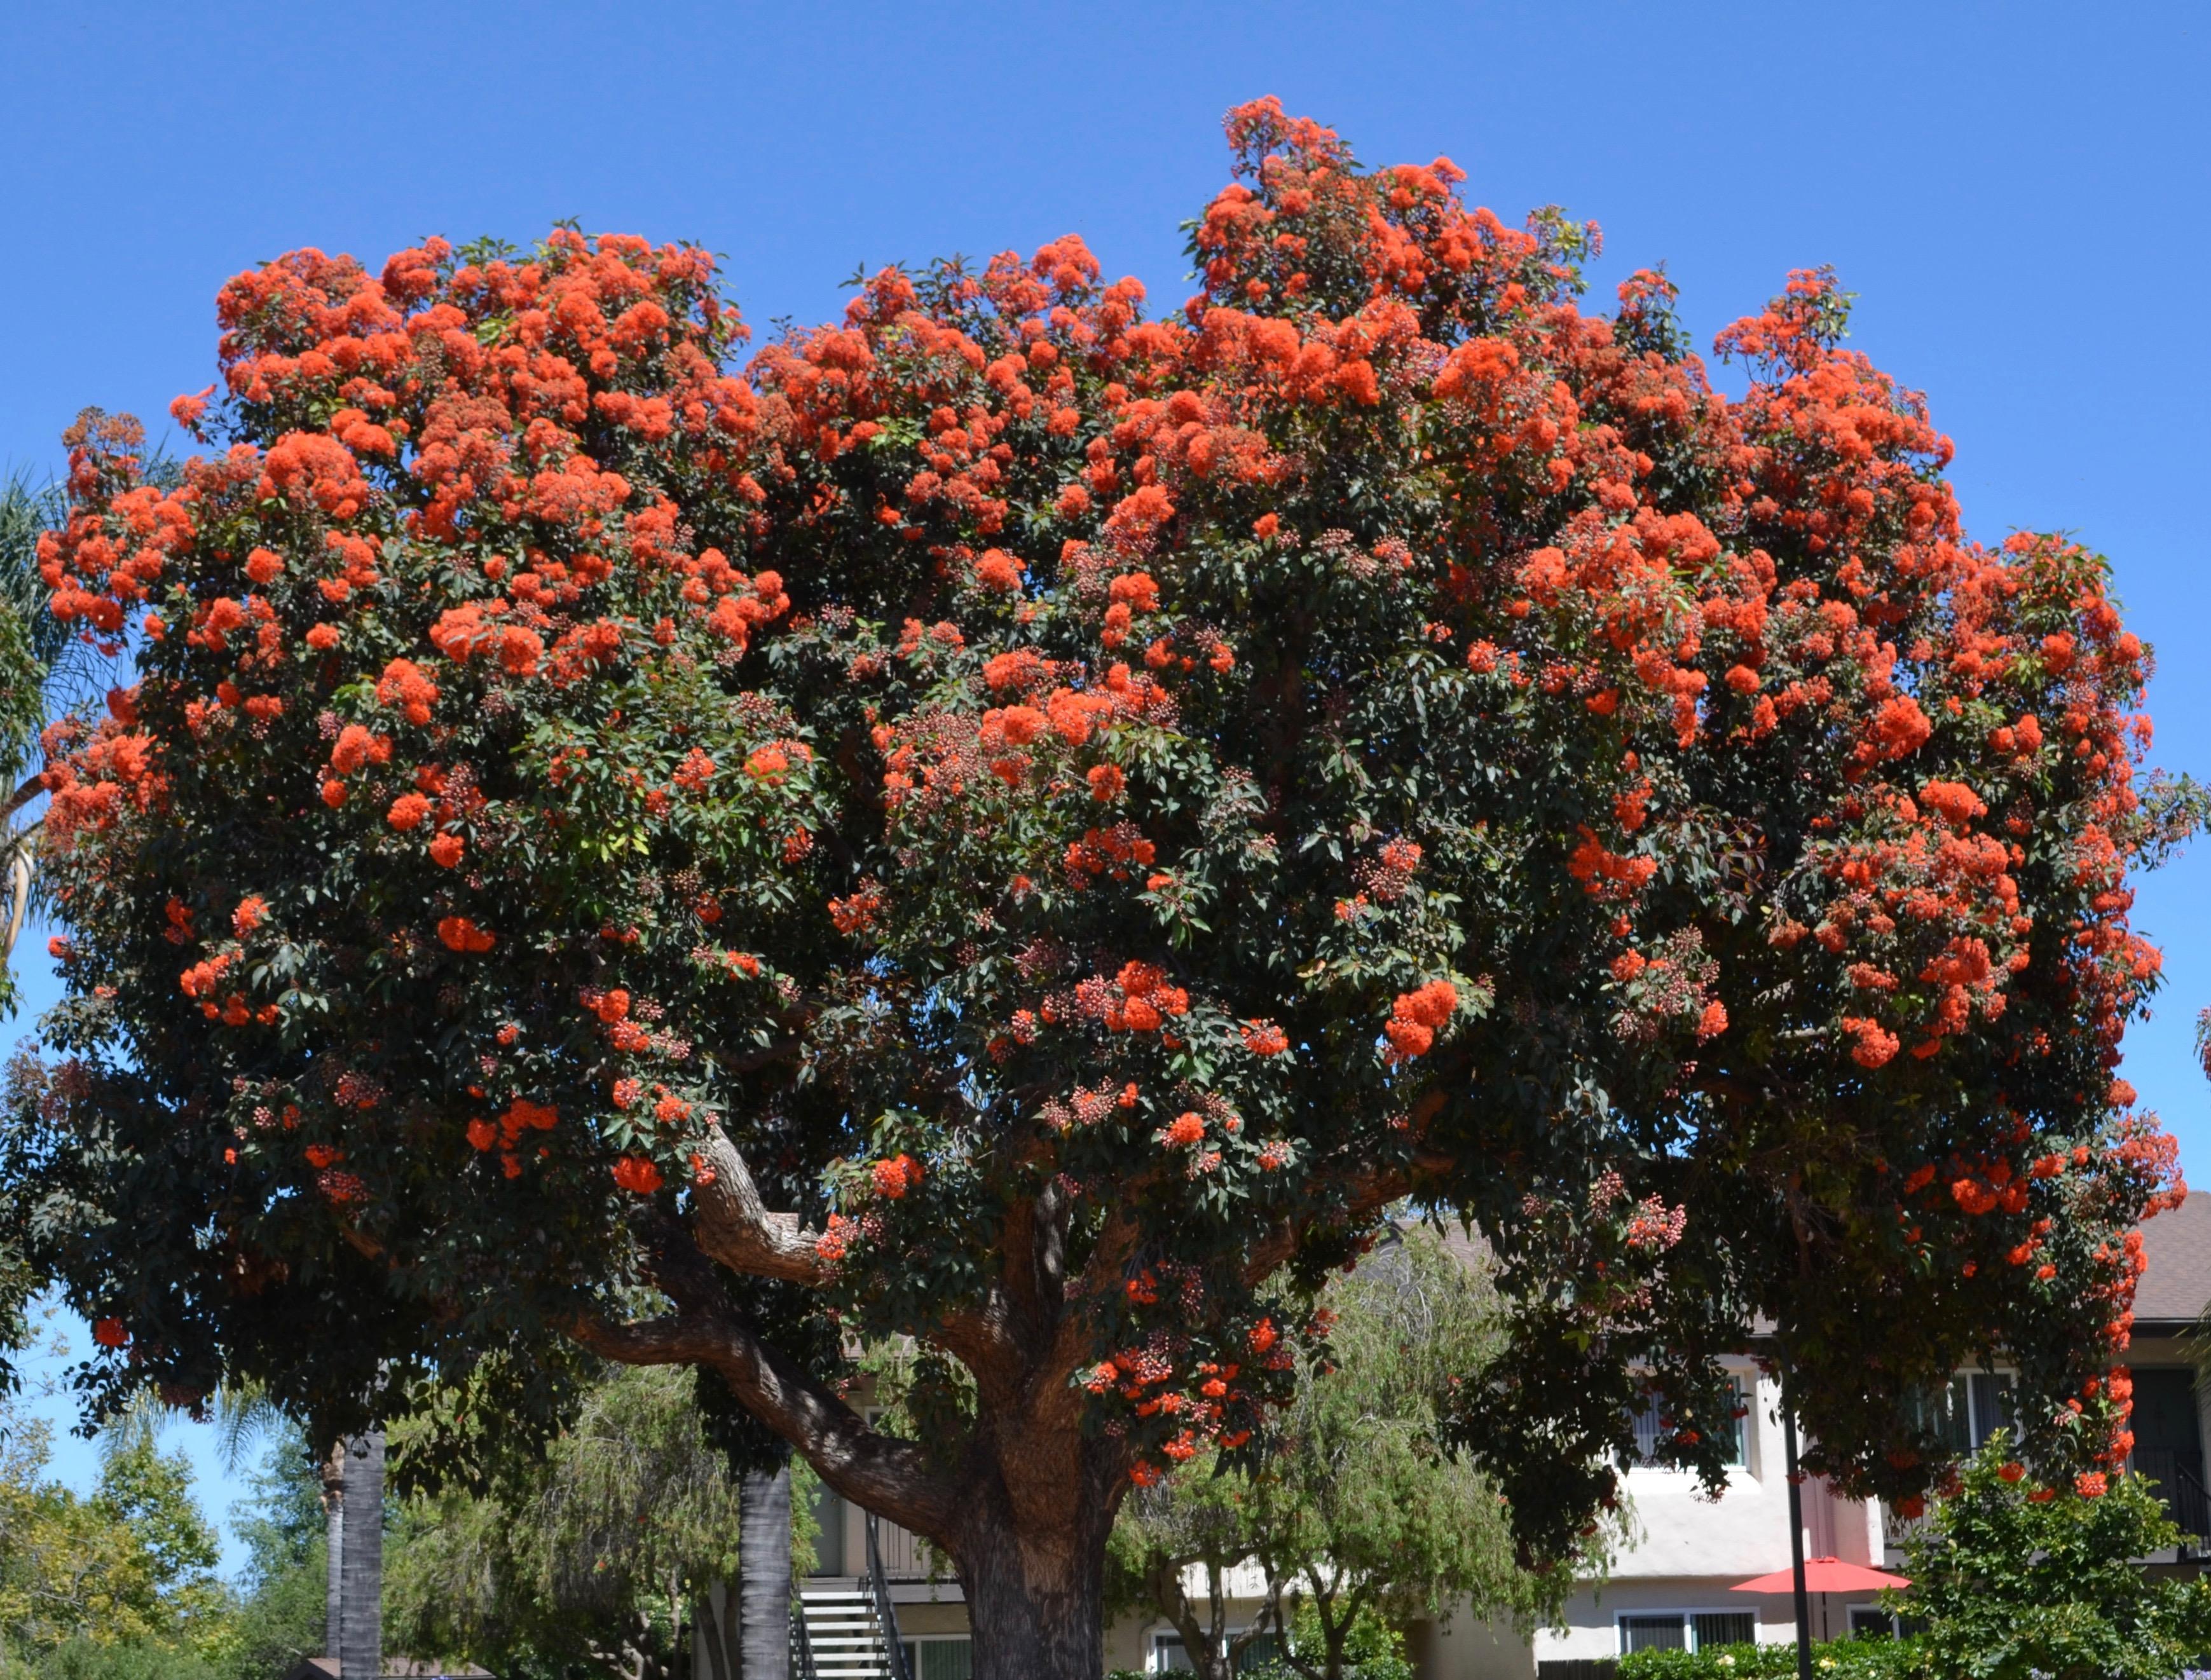 Santa Barbara Flowering Plant Identification The Santa Barbara